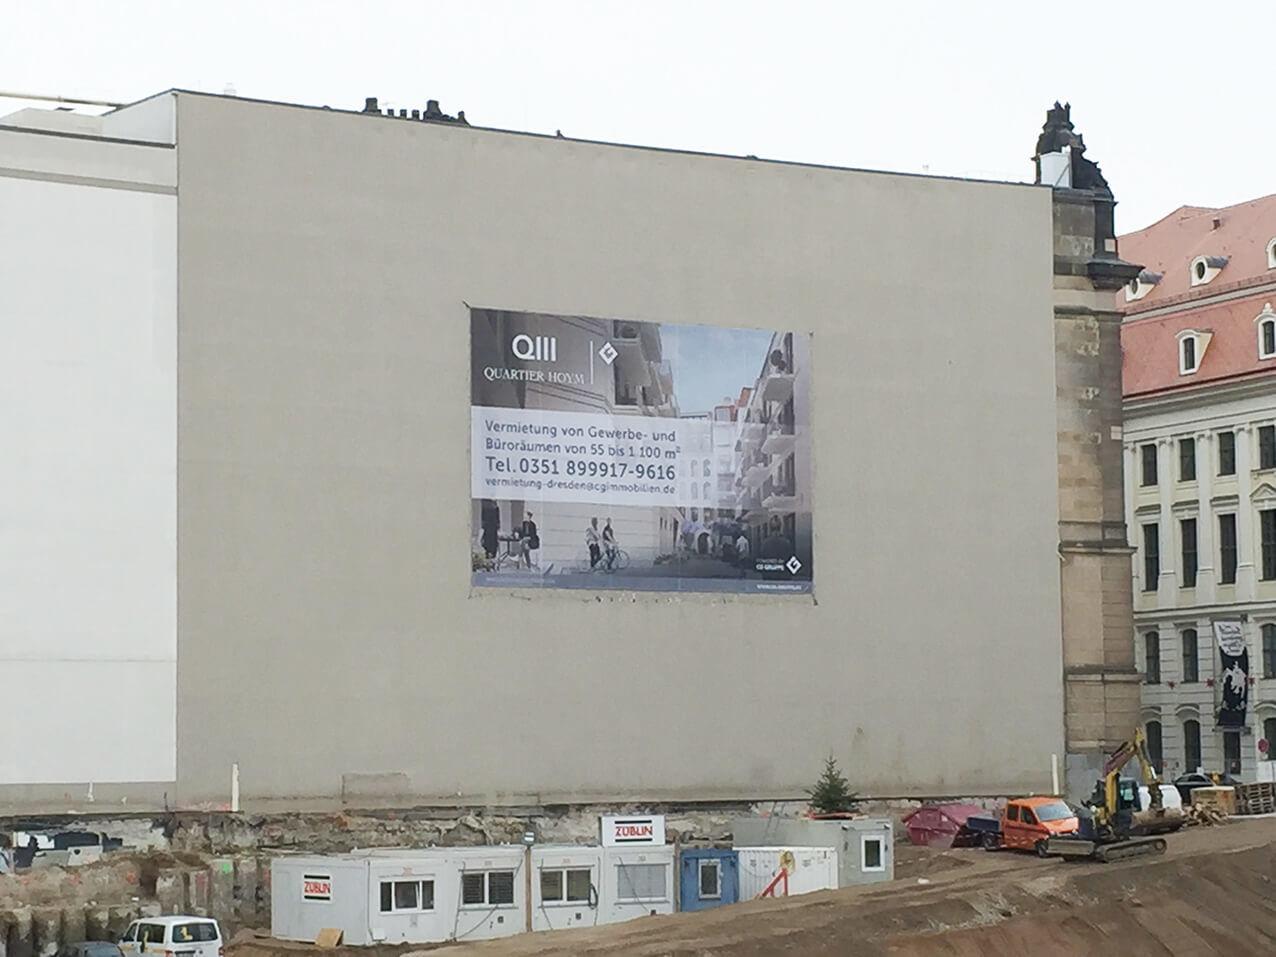 621-XXXXL-Plane-Montage-Dresden-Altstadt